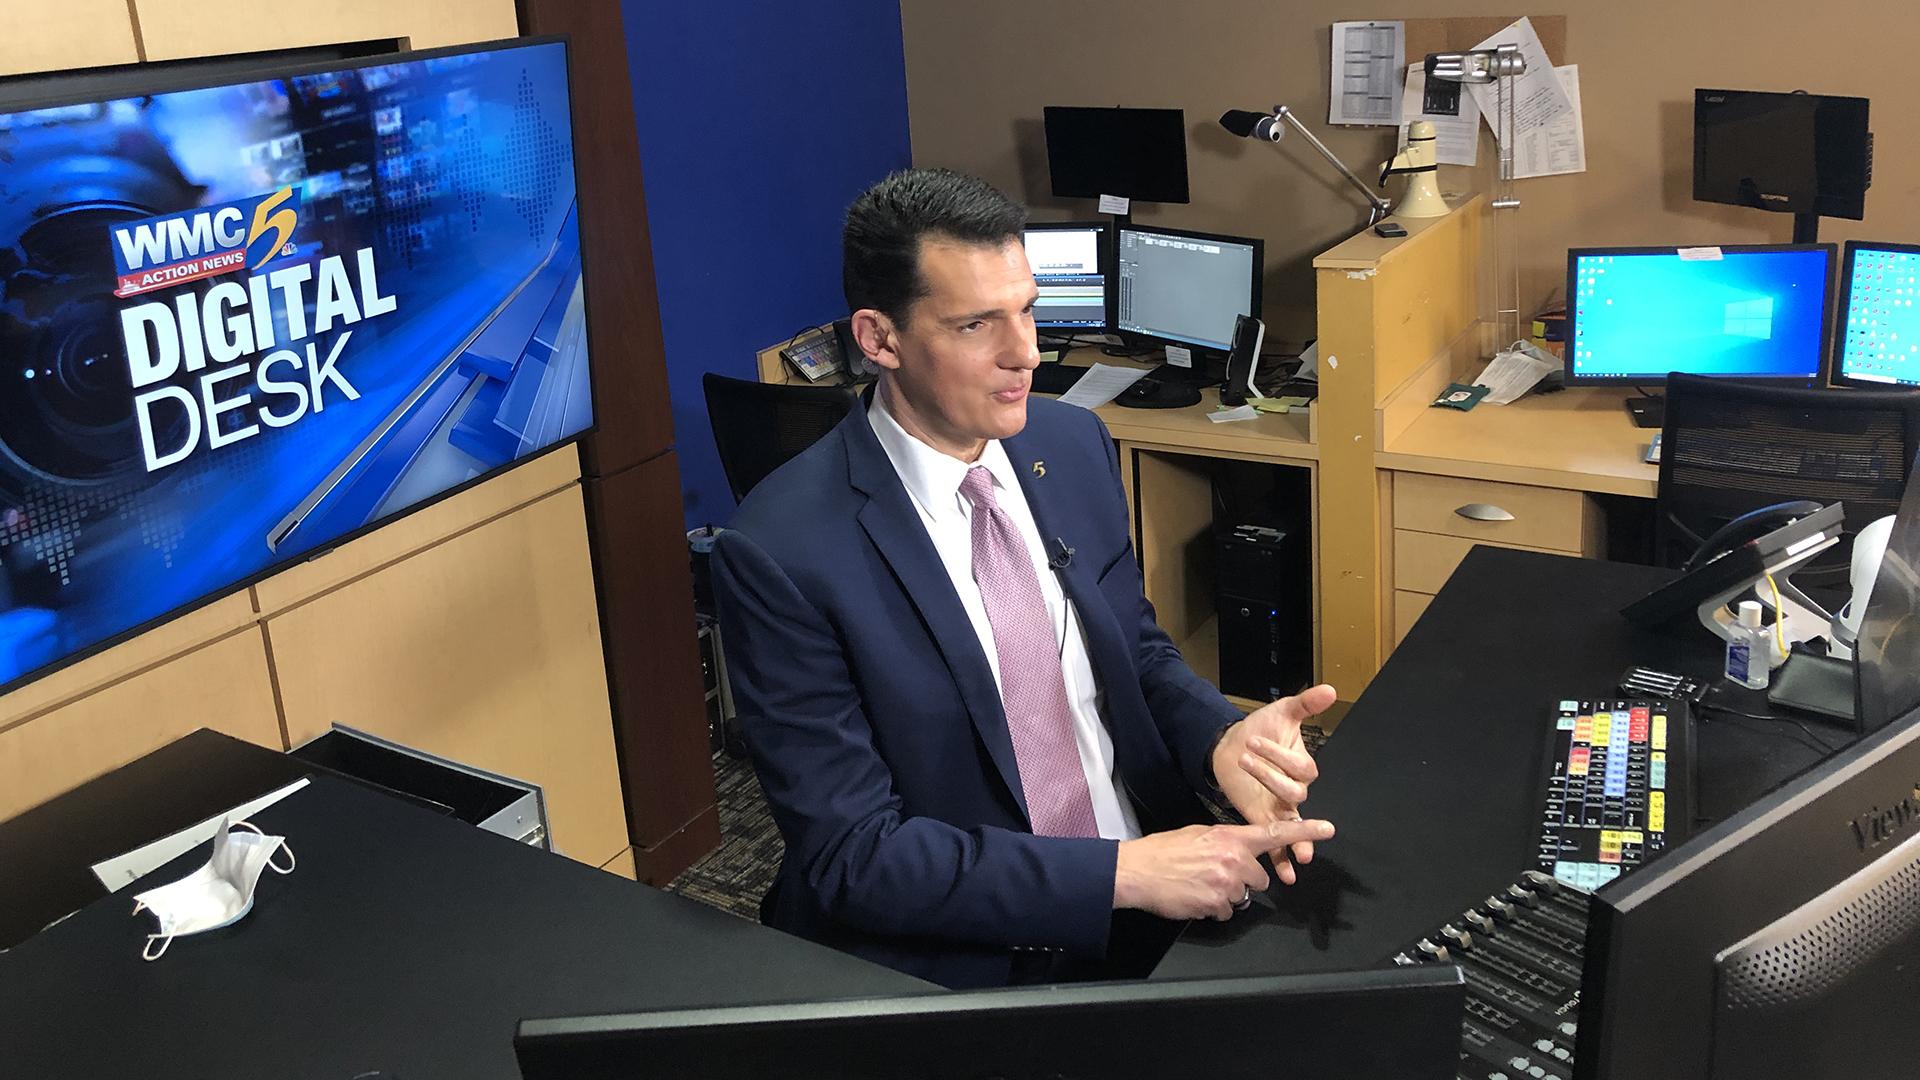 WMC 5 anchor sitting at the digital desk